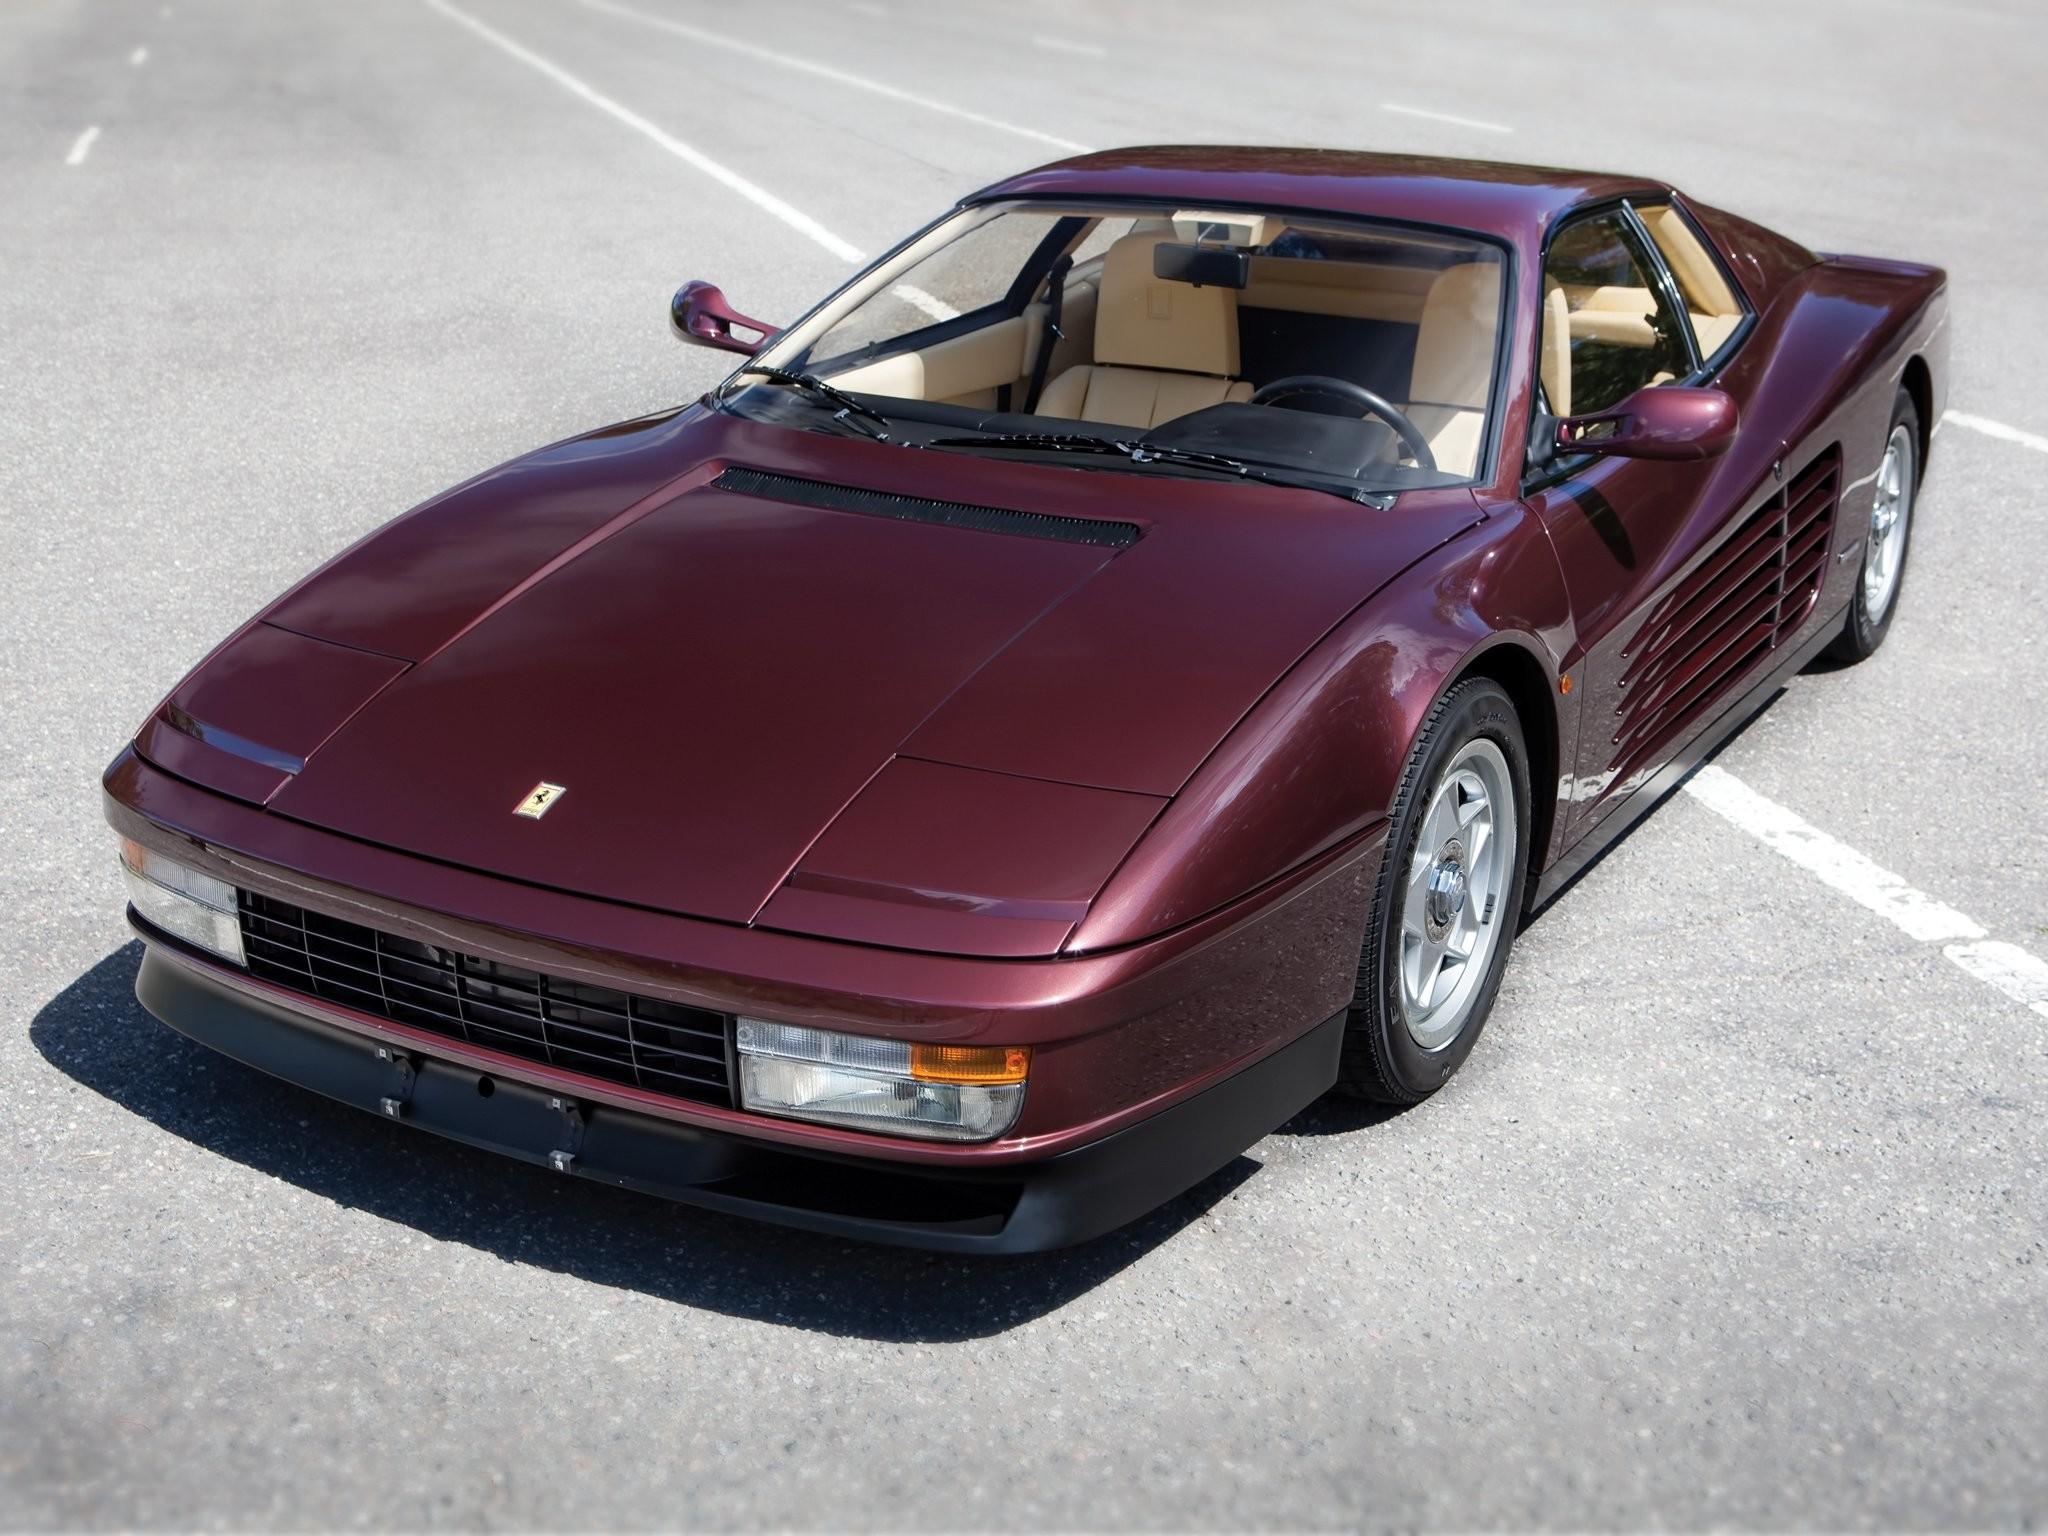 Ferrari Testarossa Wallpaper 79 Pictures